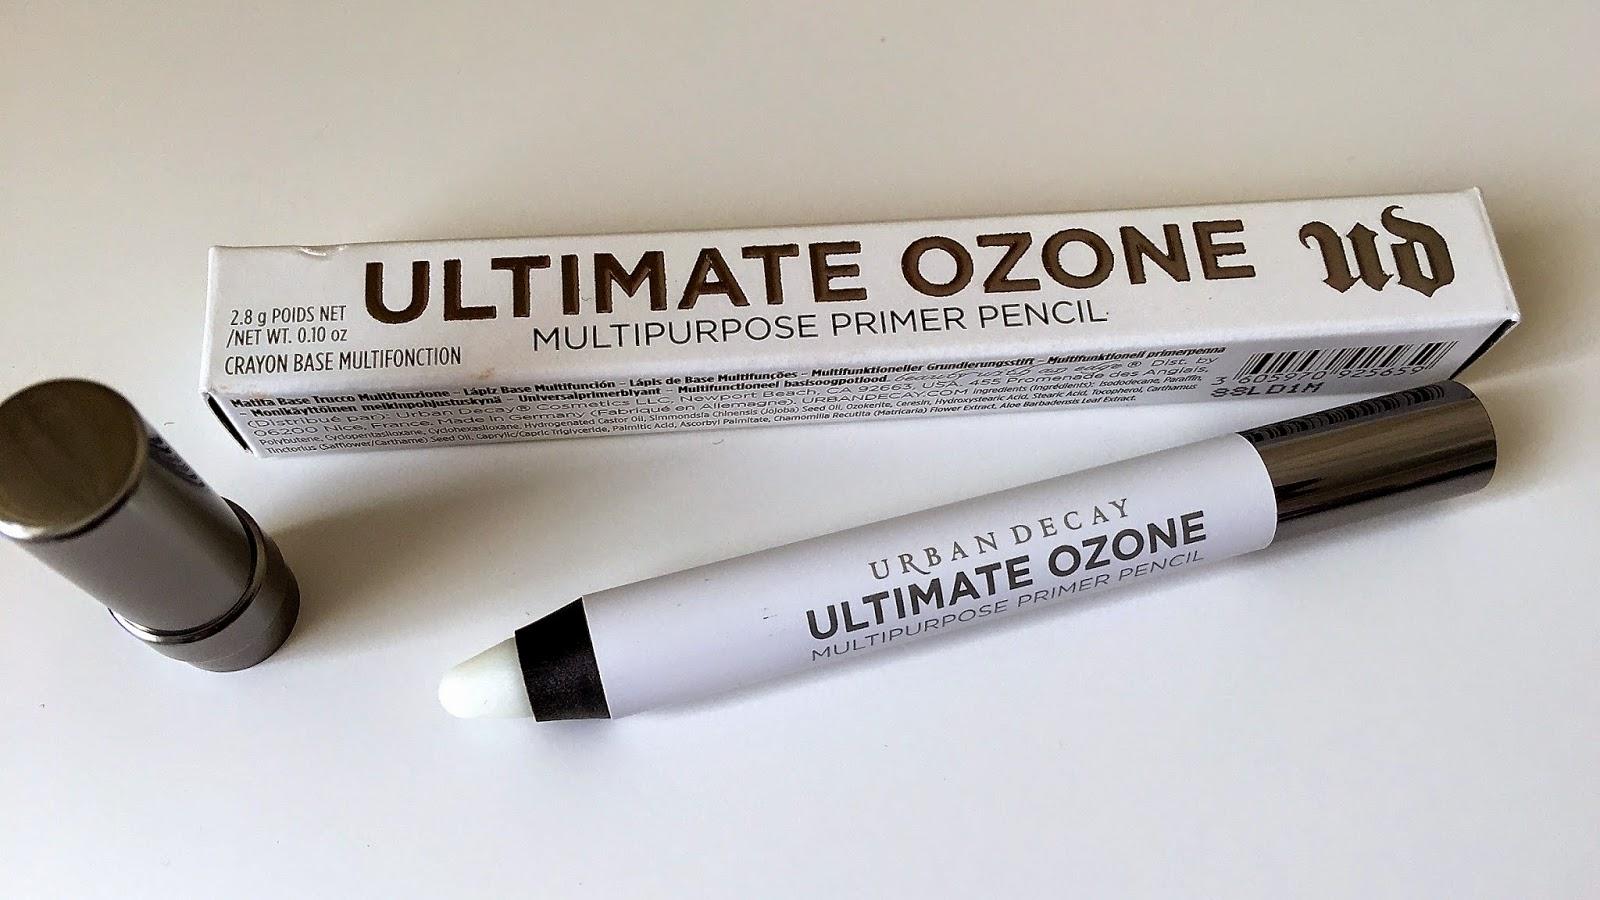 Ultimate Ozone Multipurpose Primer Pencil by Urban Decay #12